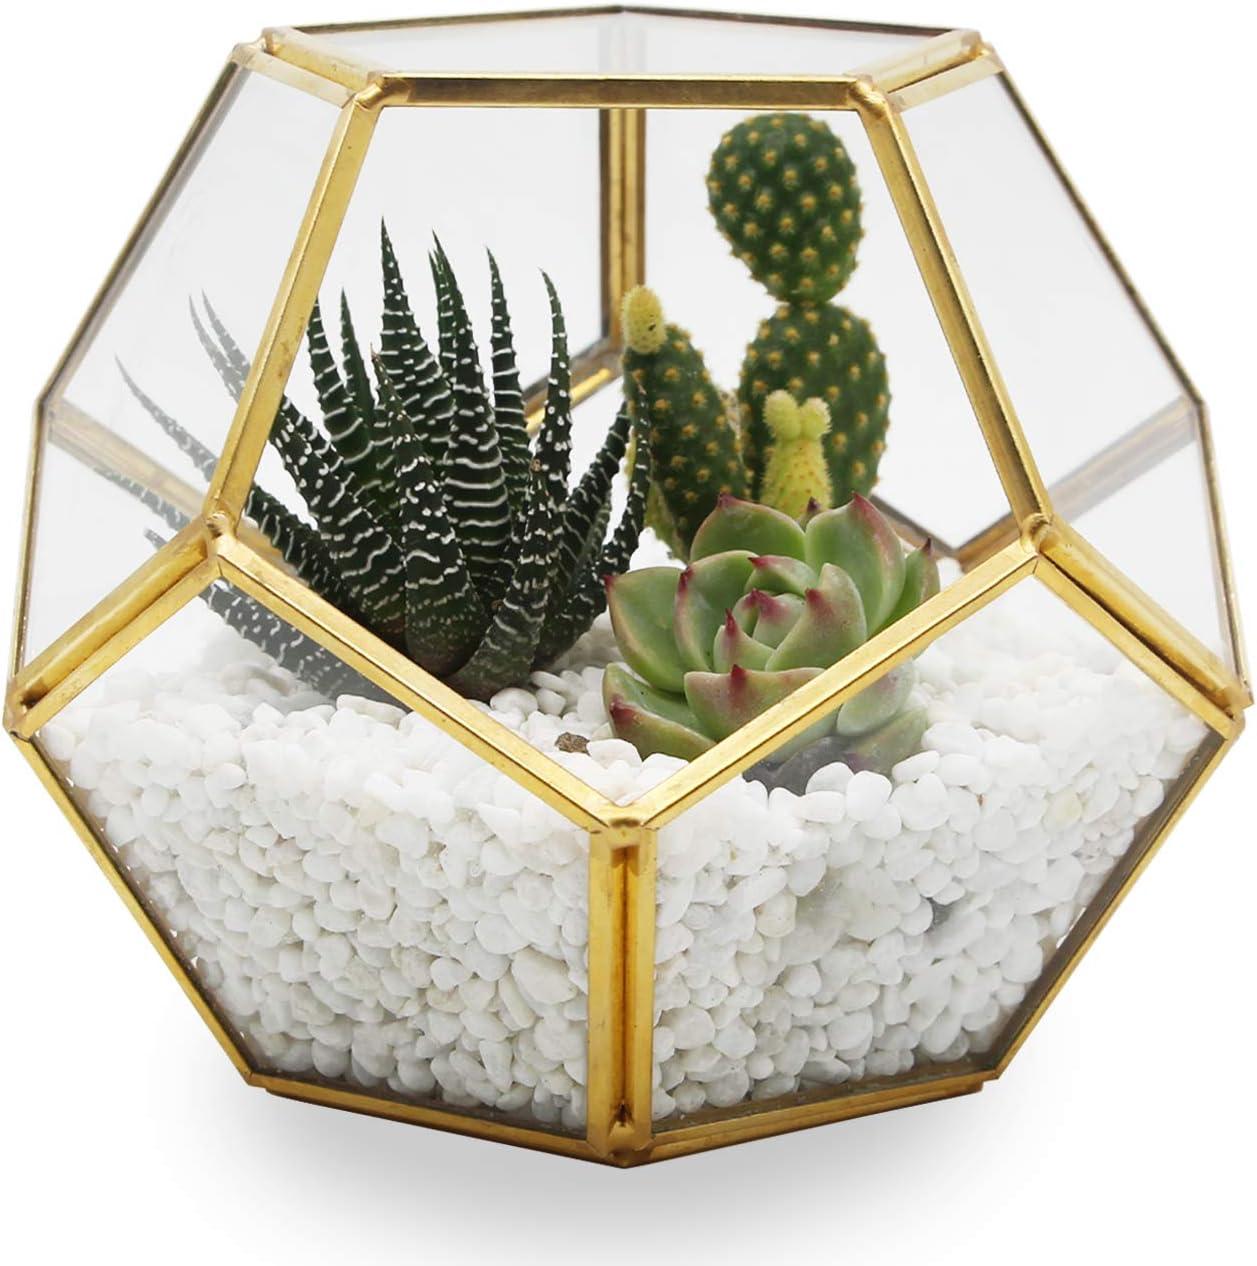 1x Geometric Moss Succulent Glass Terrarium Plant Pot Display Flower Vase Holder